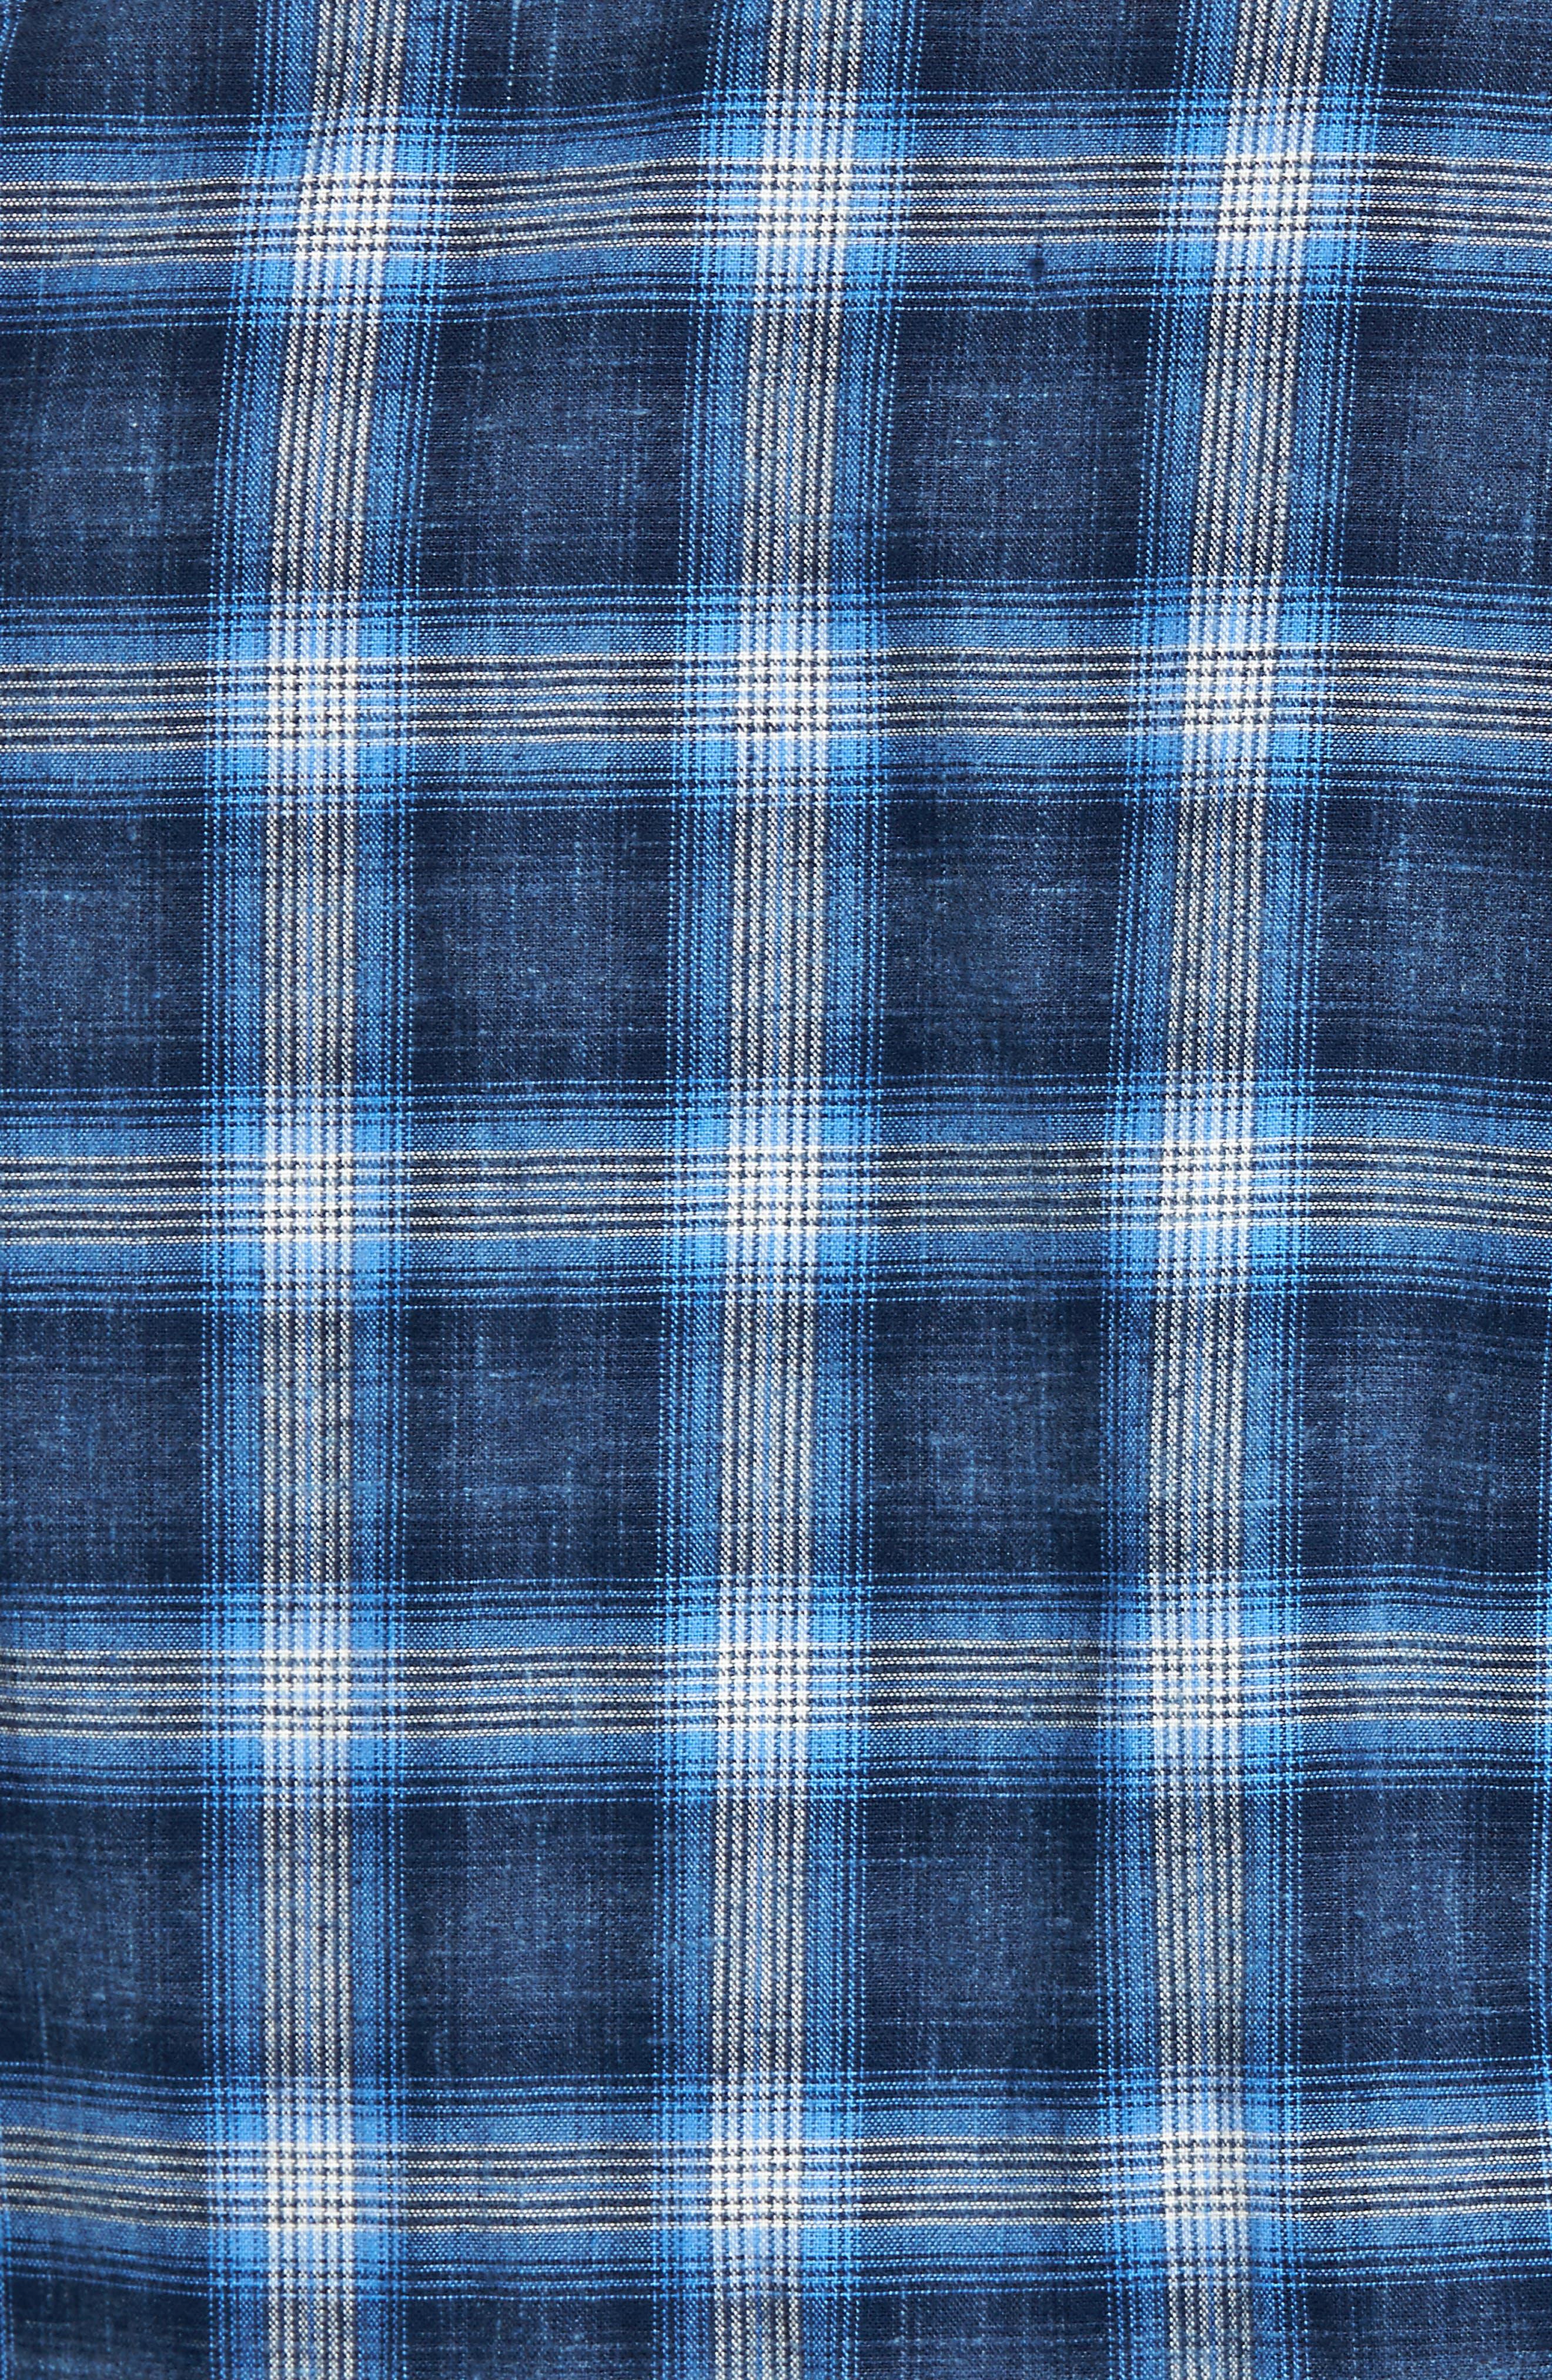 Trim Fit Plaid Sport Shirt,                             Alternate thumbnail 5, color,                             Black Blue Homespun Plaid